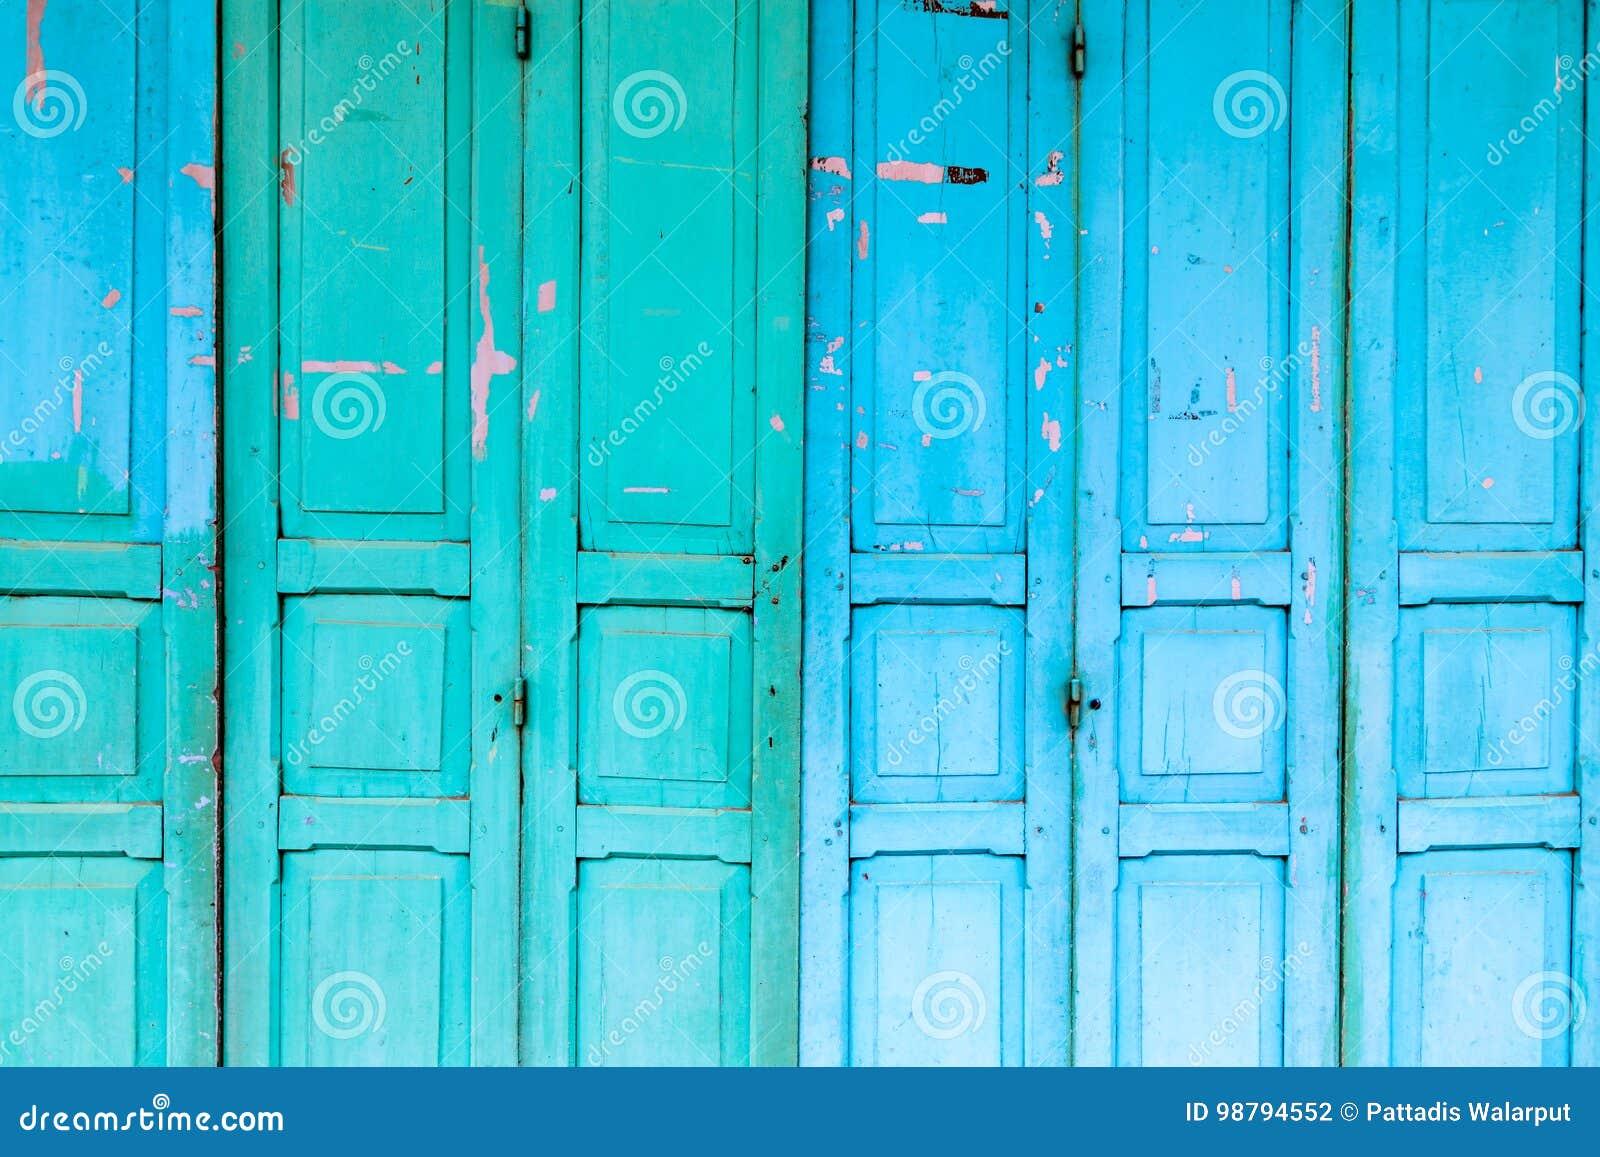 Vintage wooden blue cyan doors